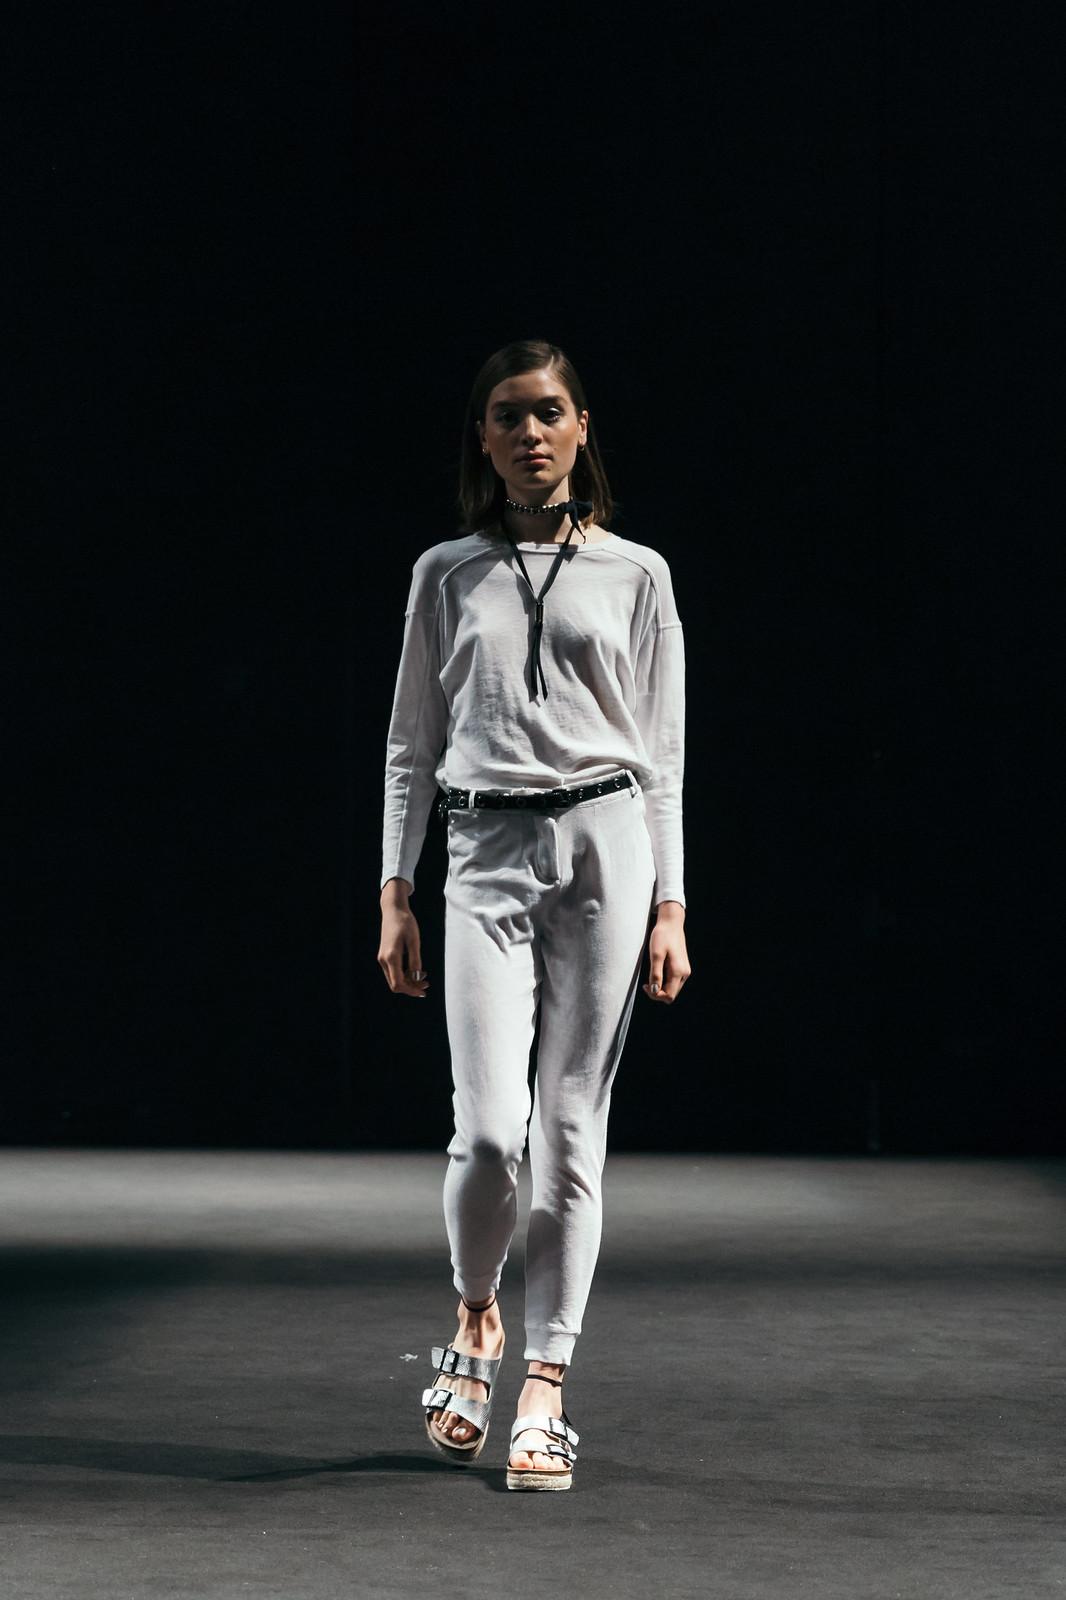 Jessie Chanes - Seams for a desire - 080 Bacelona Fashion #080bcnfasion -35